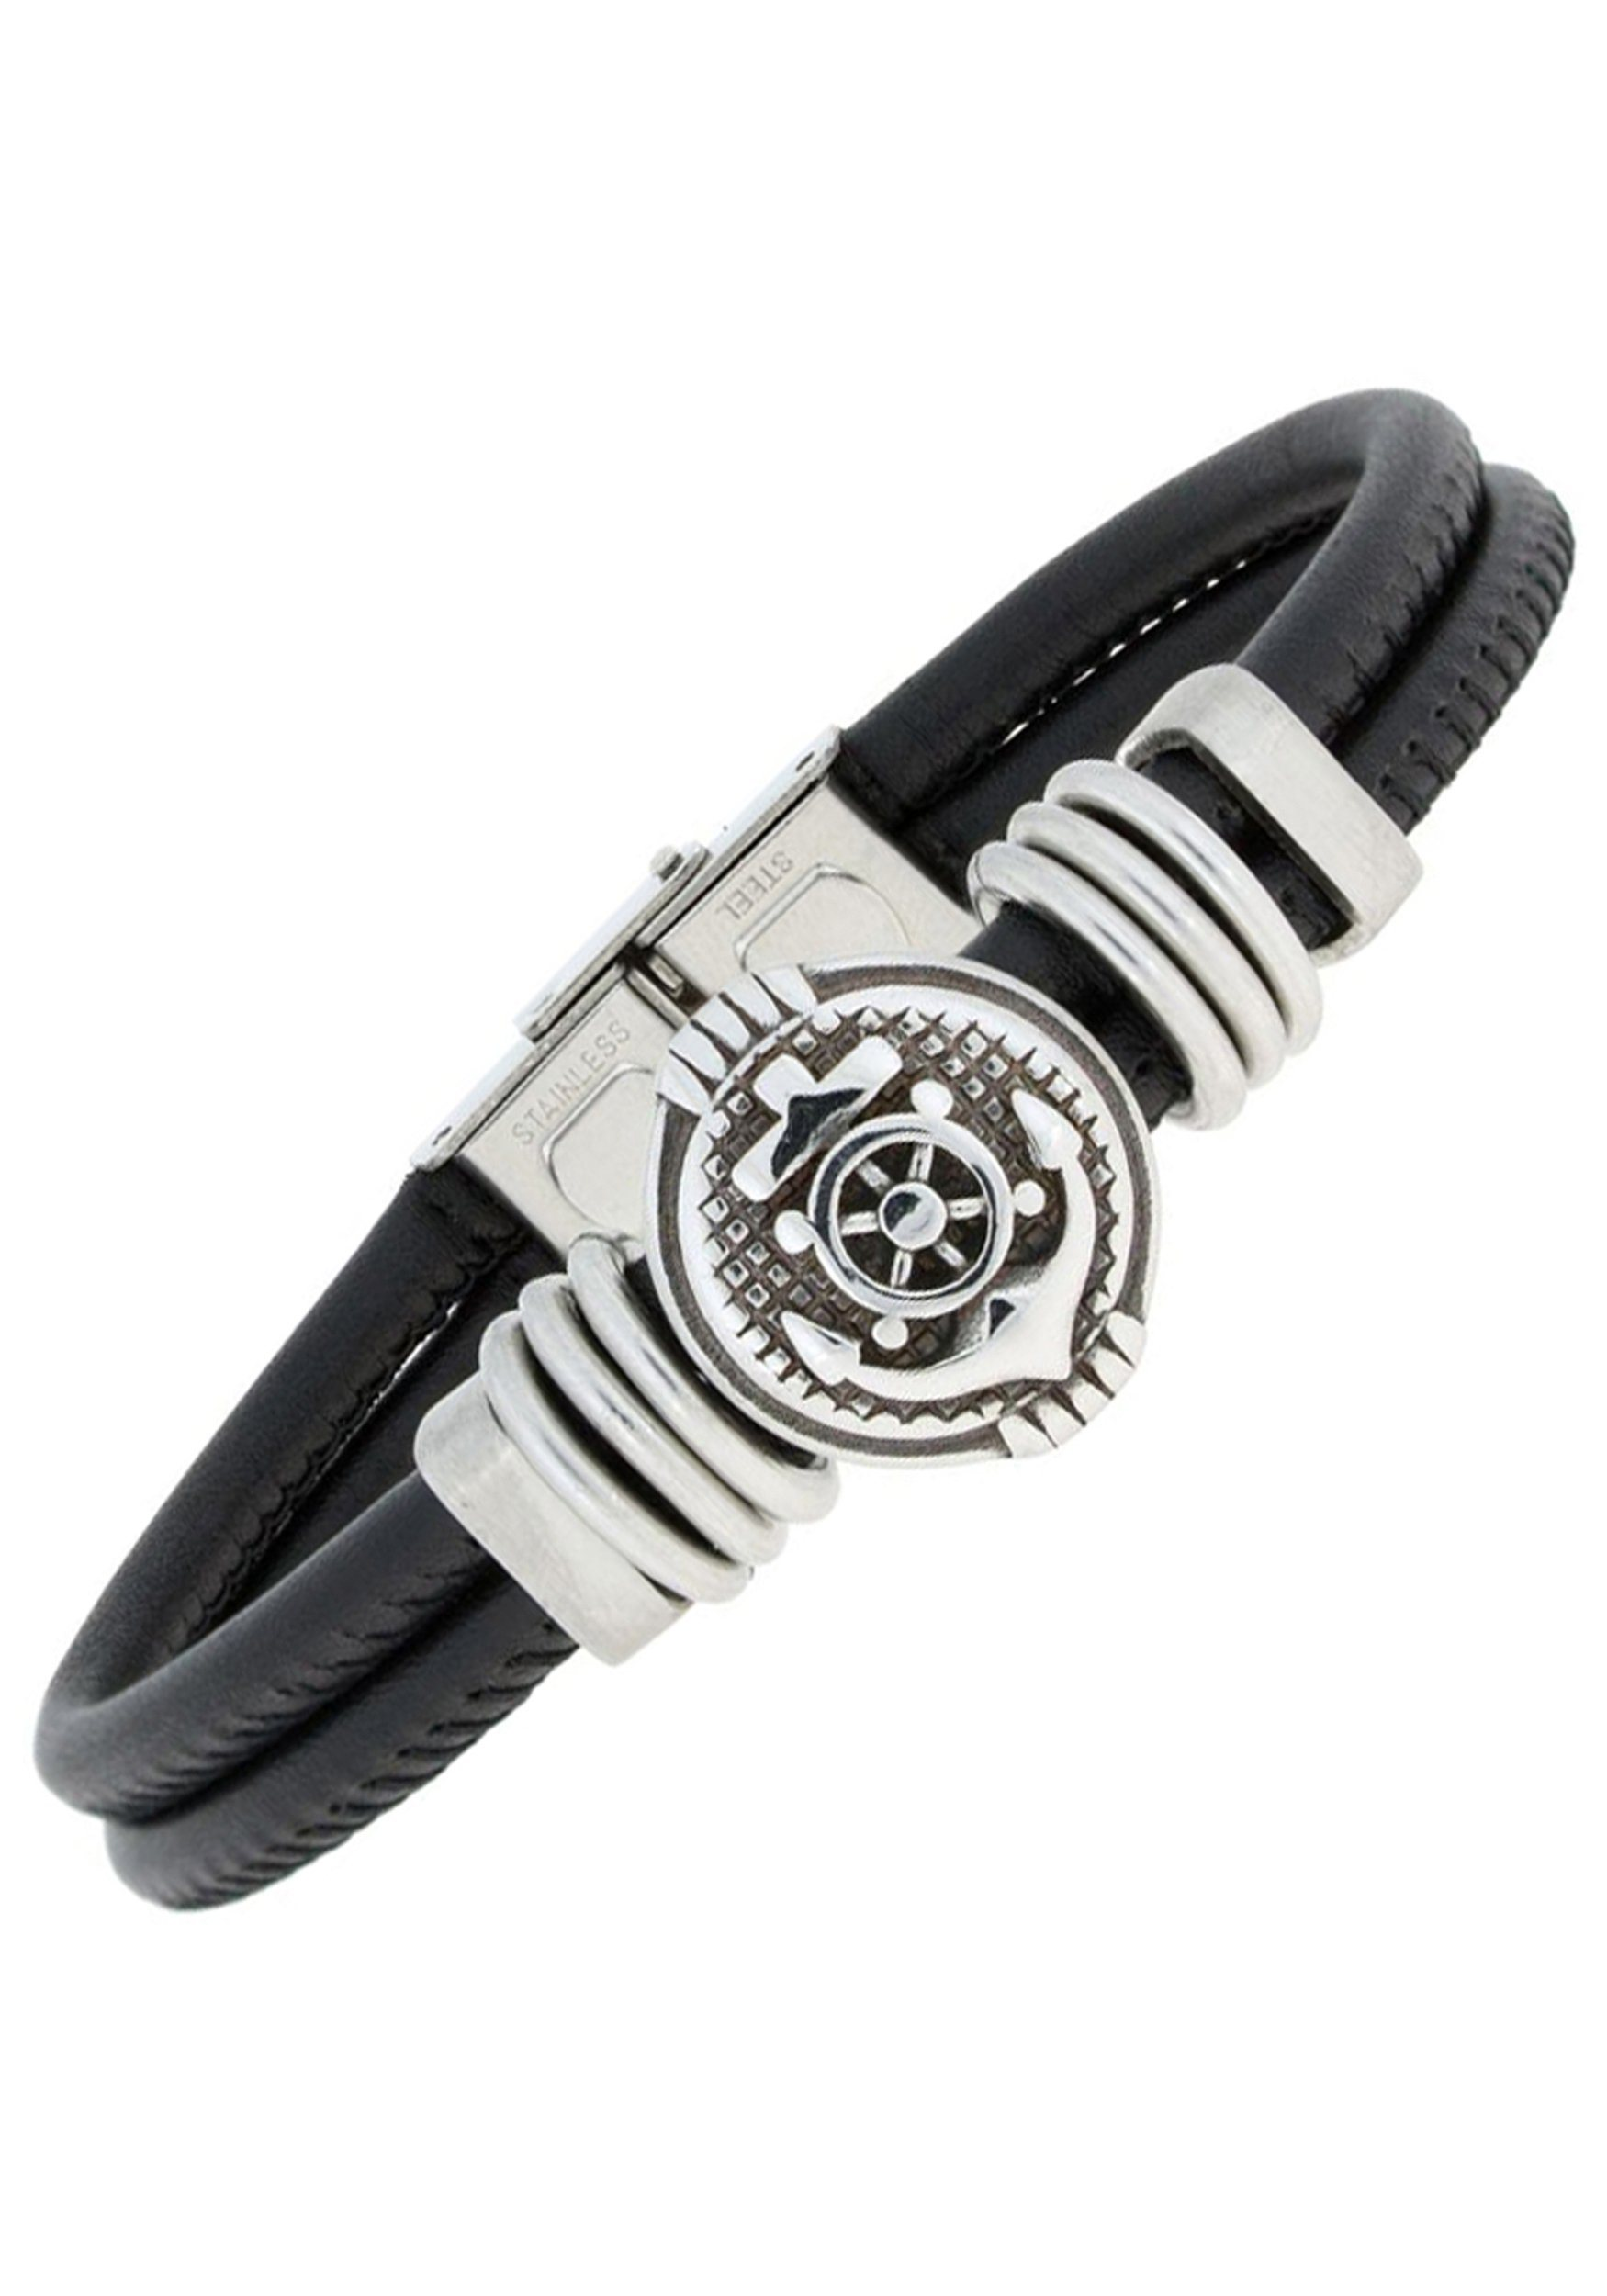 JOBO Lederarmband »Anker« Leder mit Edelstahl 19 cm | Schmuck > Armbänder > Lederarmbänder | JOBO